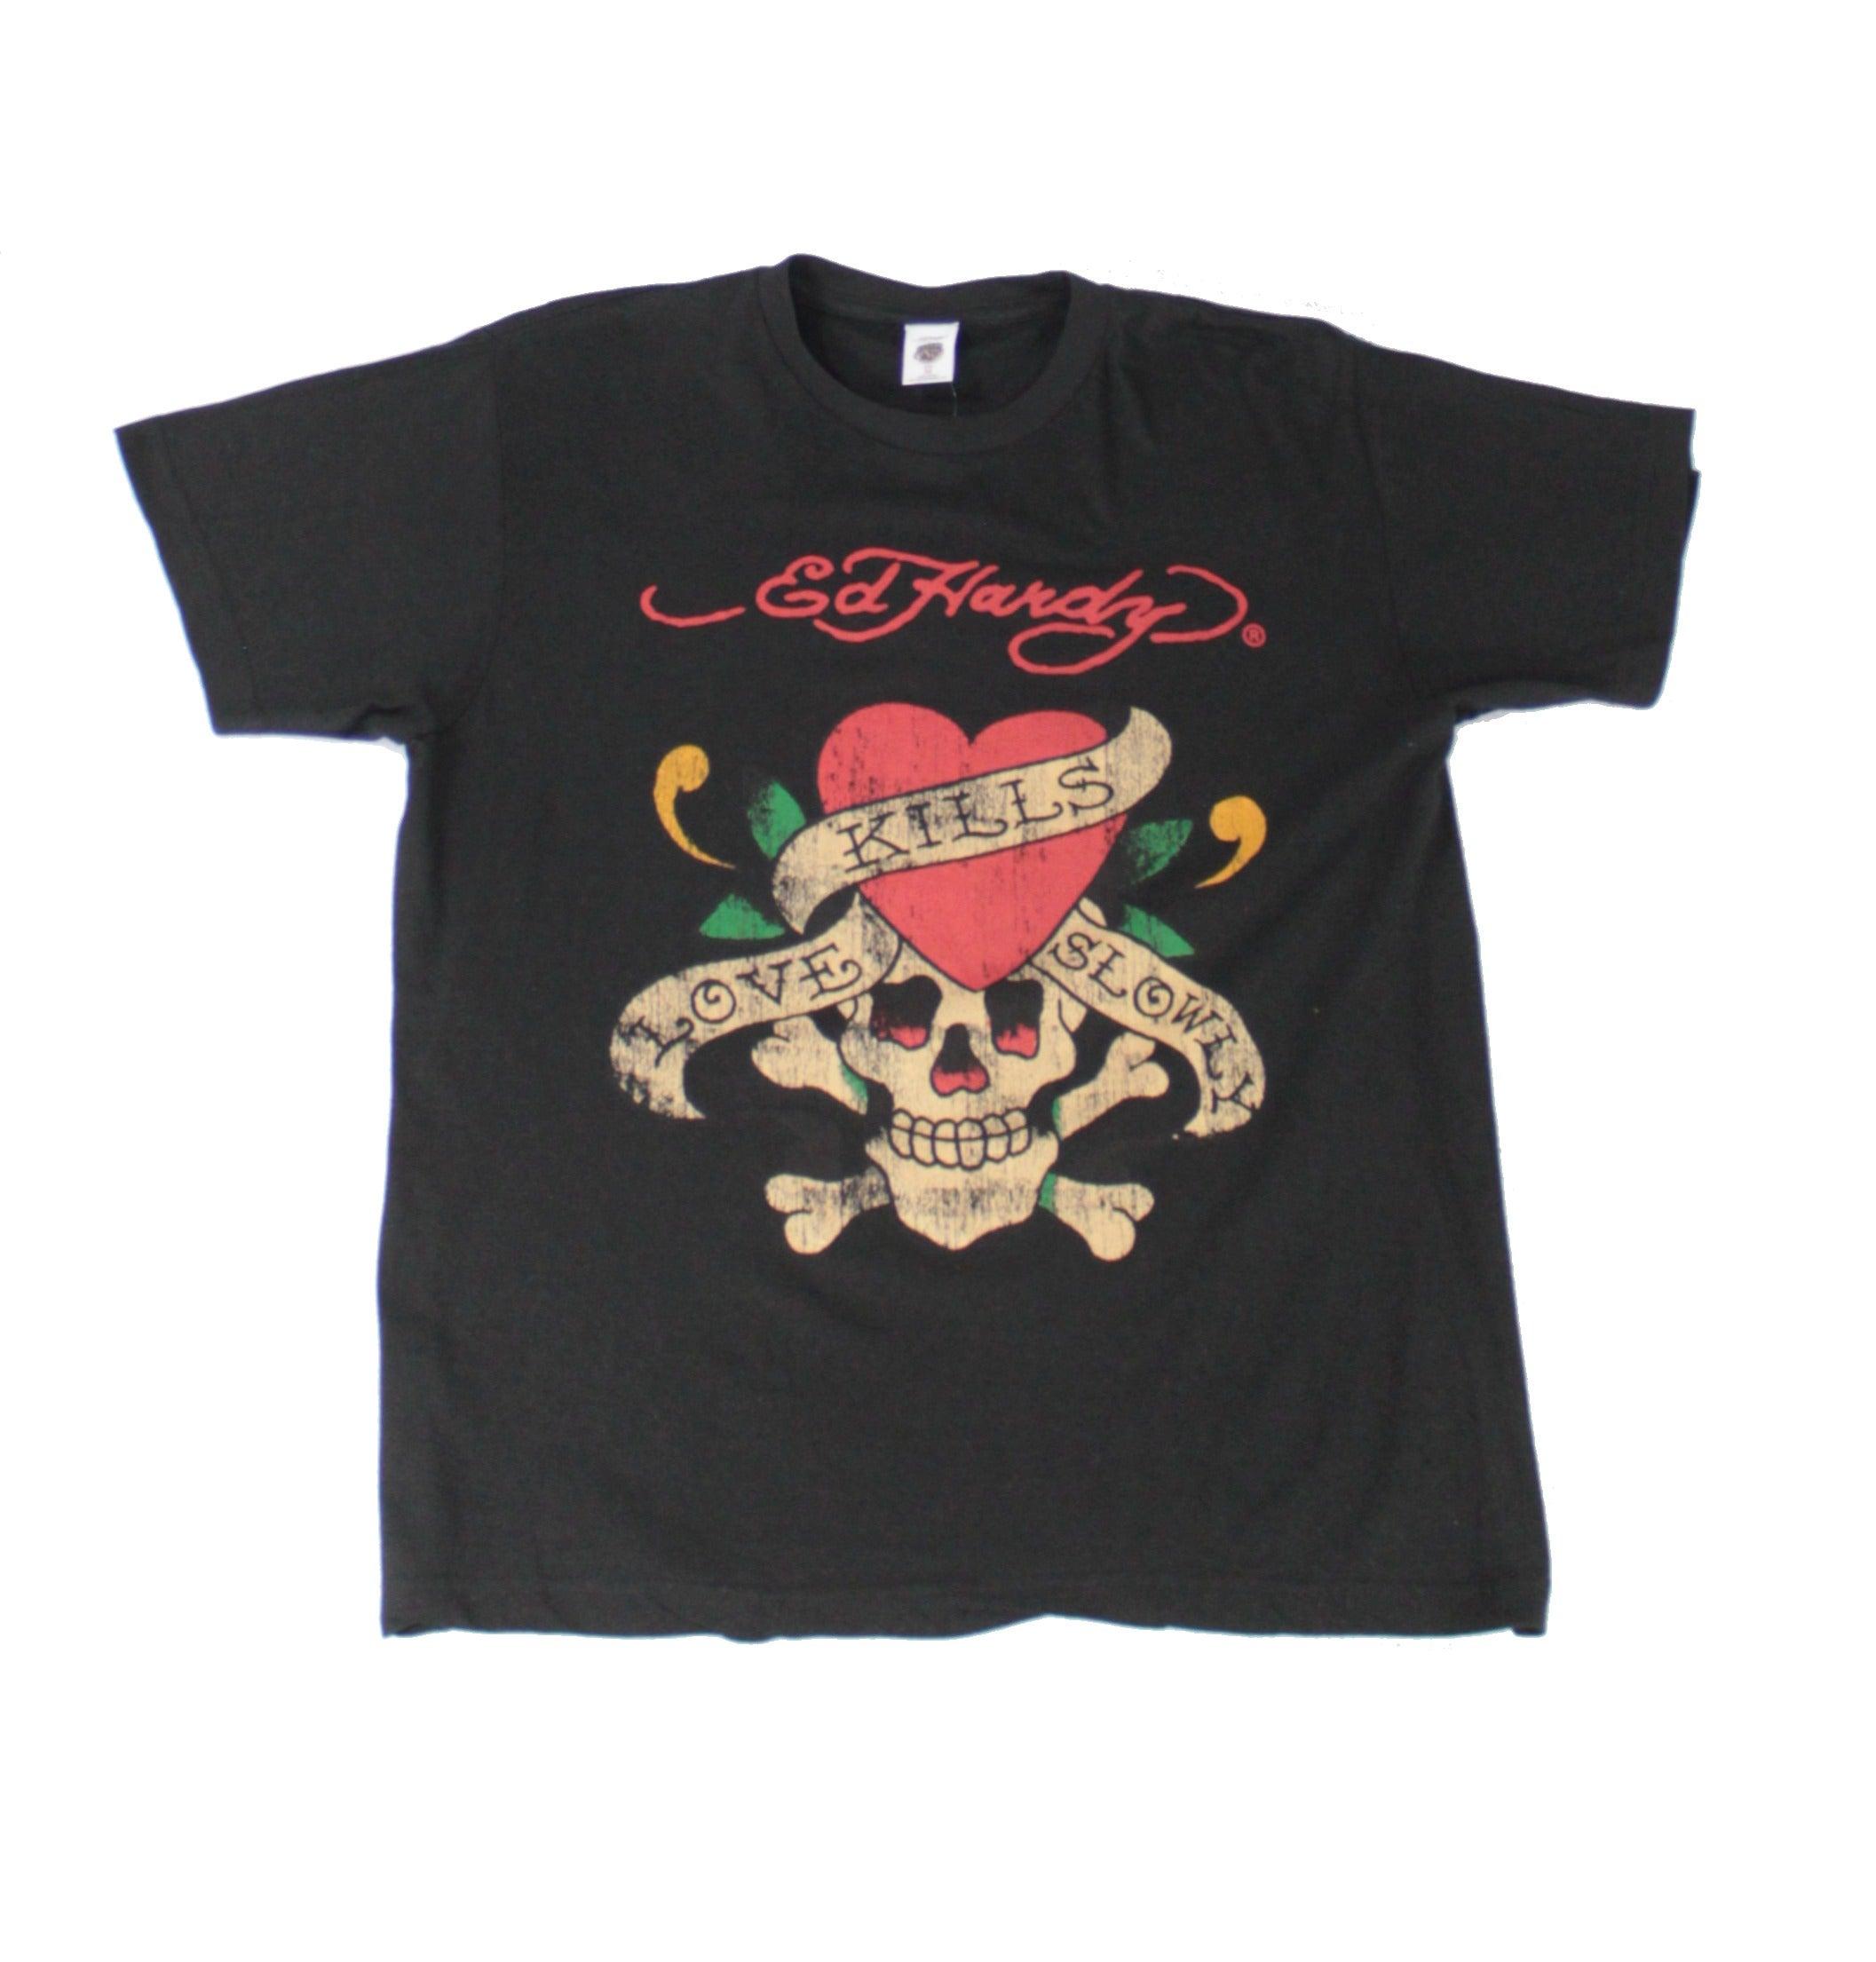 Ed Hardy Mens T-Shirt Black Size XL Crew Neck Love Kills Slowly Tee